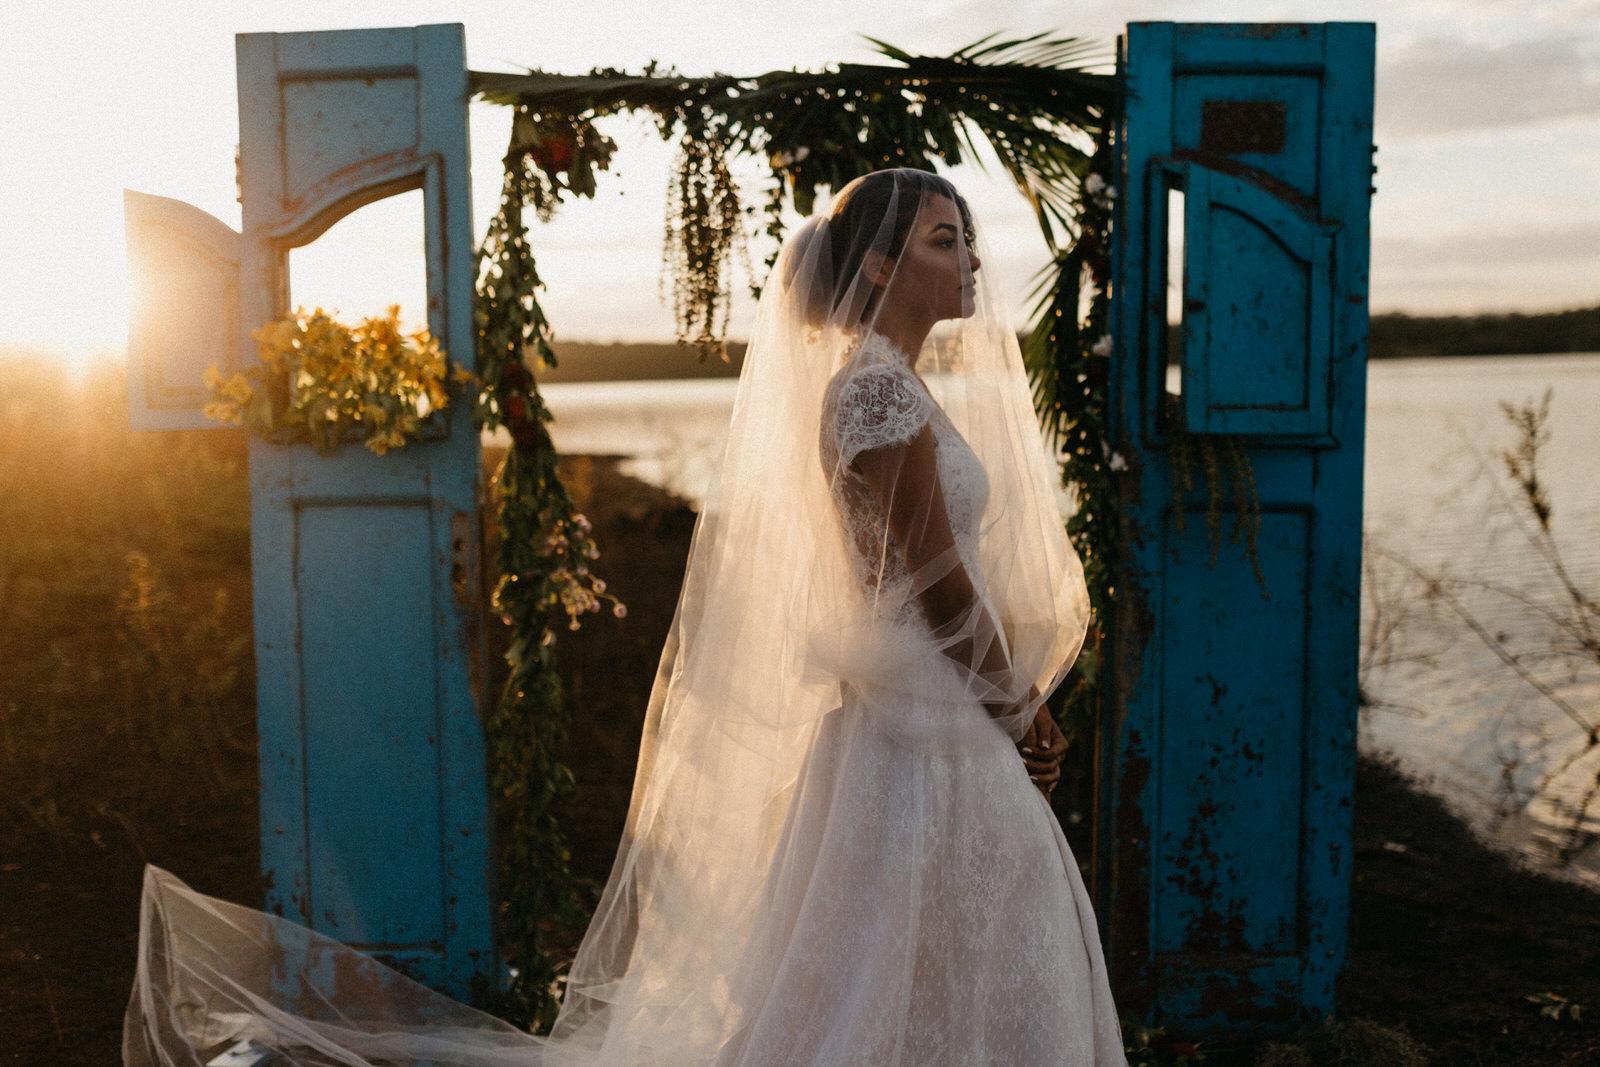 Céu_fotografia_casamentos_goiás_brasil_folk_noivas_brides_alternativo (55).jpg